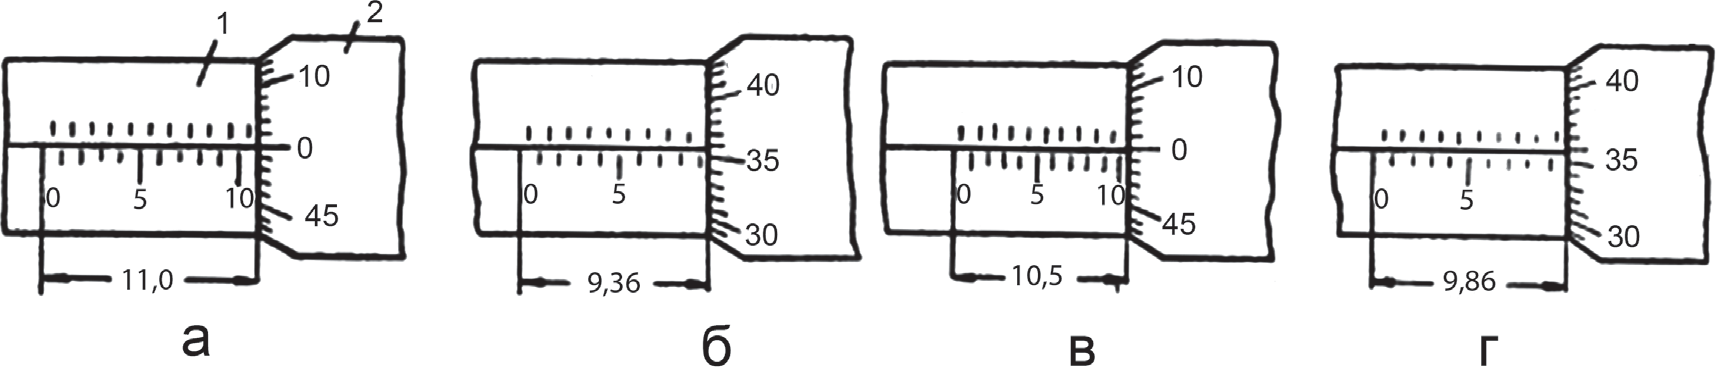 Методика отсчета размеров по шкале микрометрического инструмента